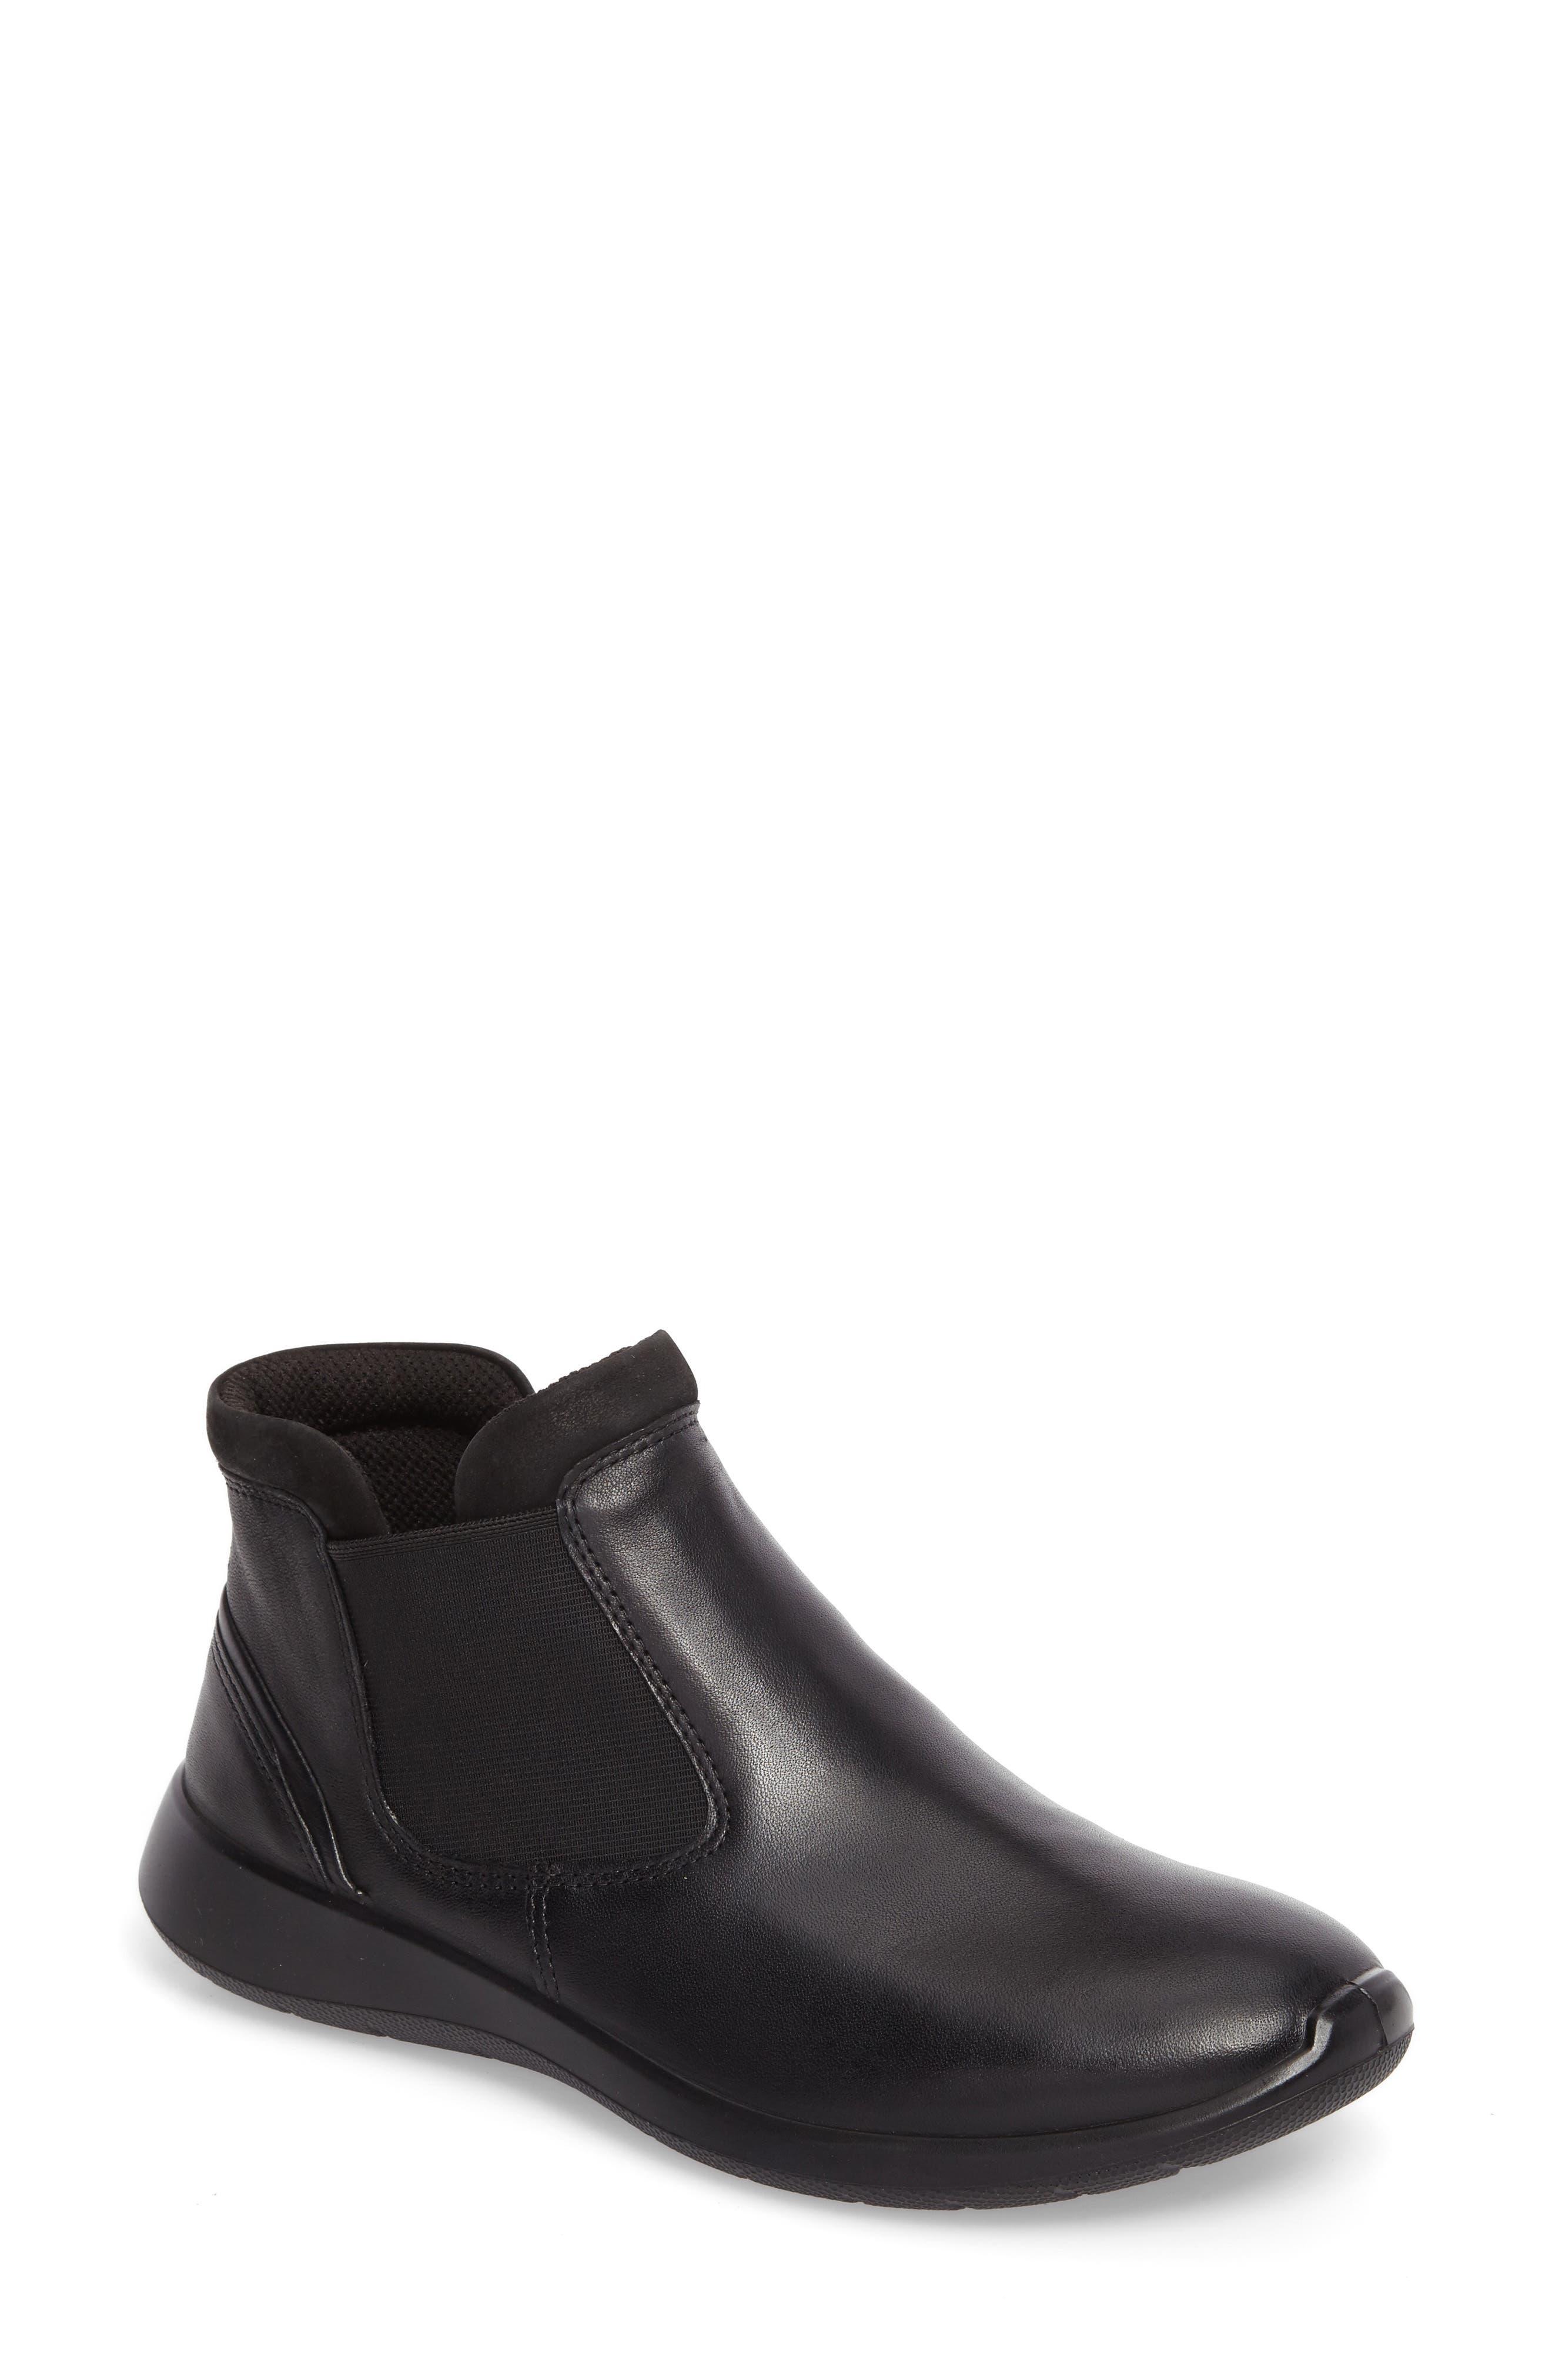 Alternate Image 1 Selected - ECCO Soft 5 Chelsea Boot (Women)